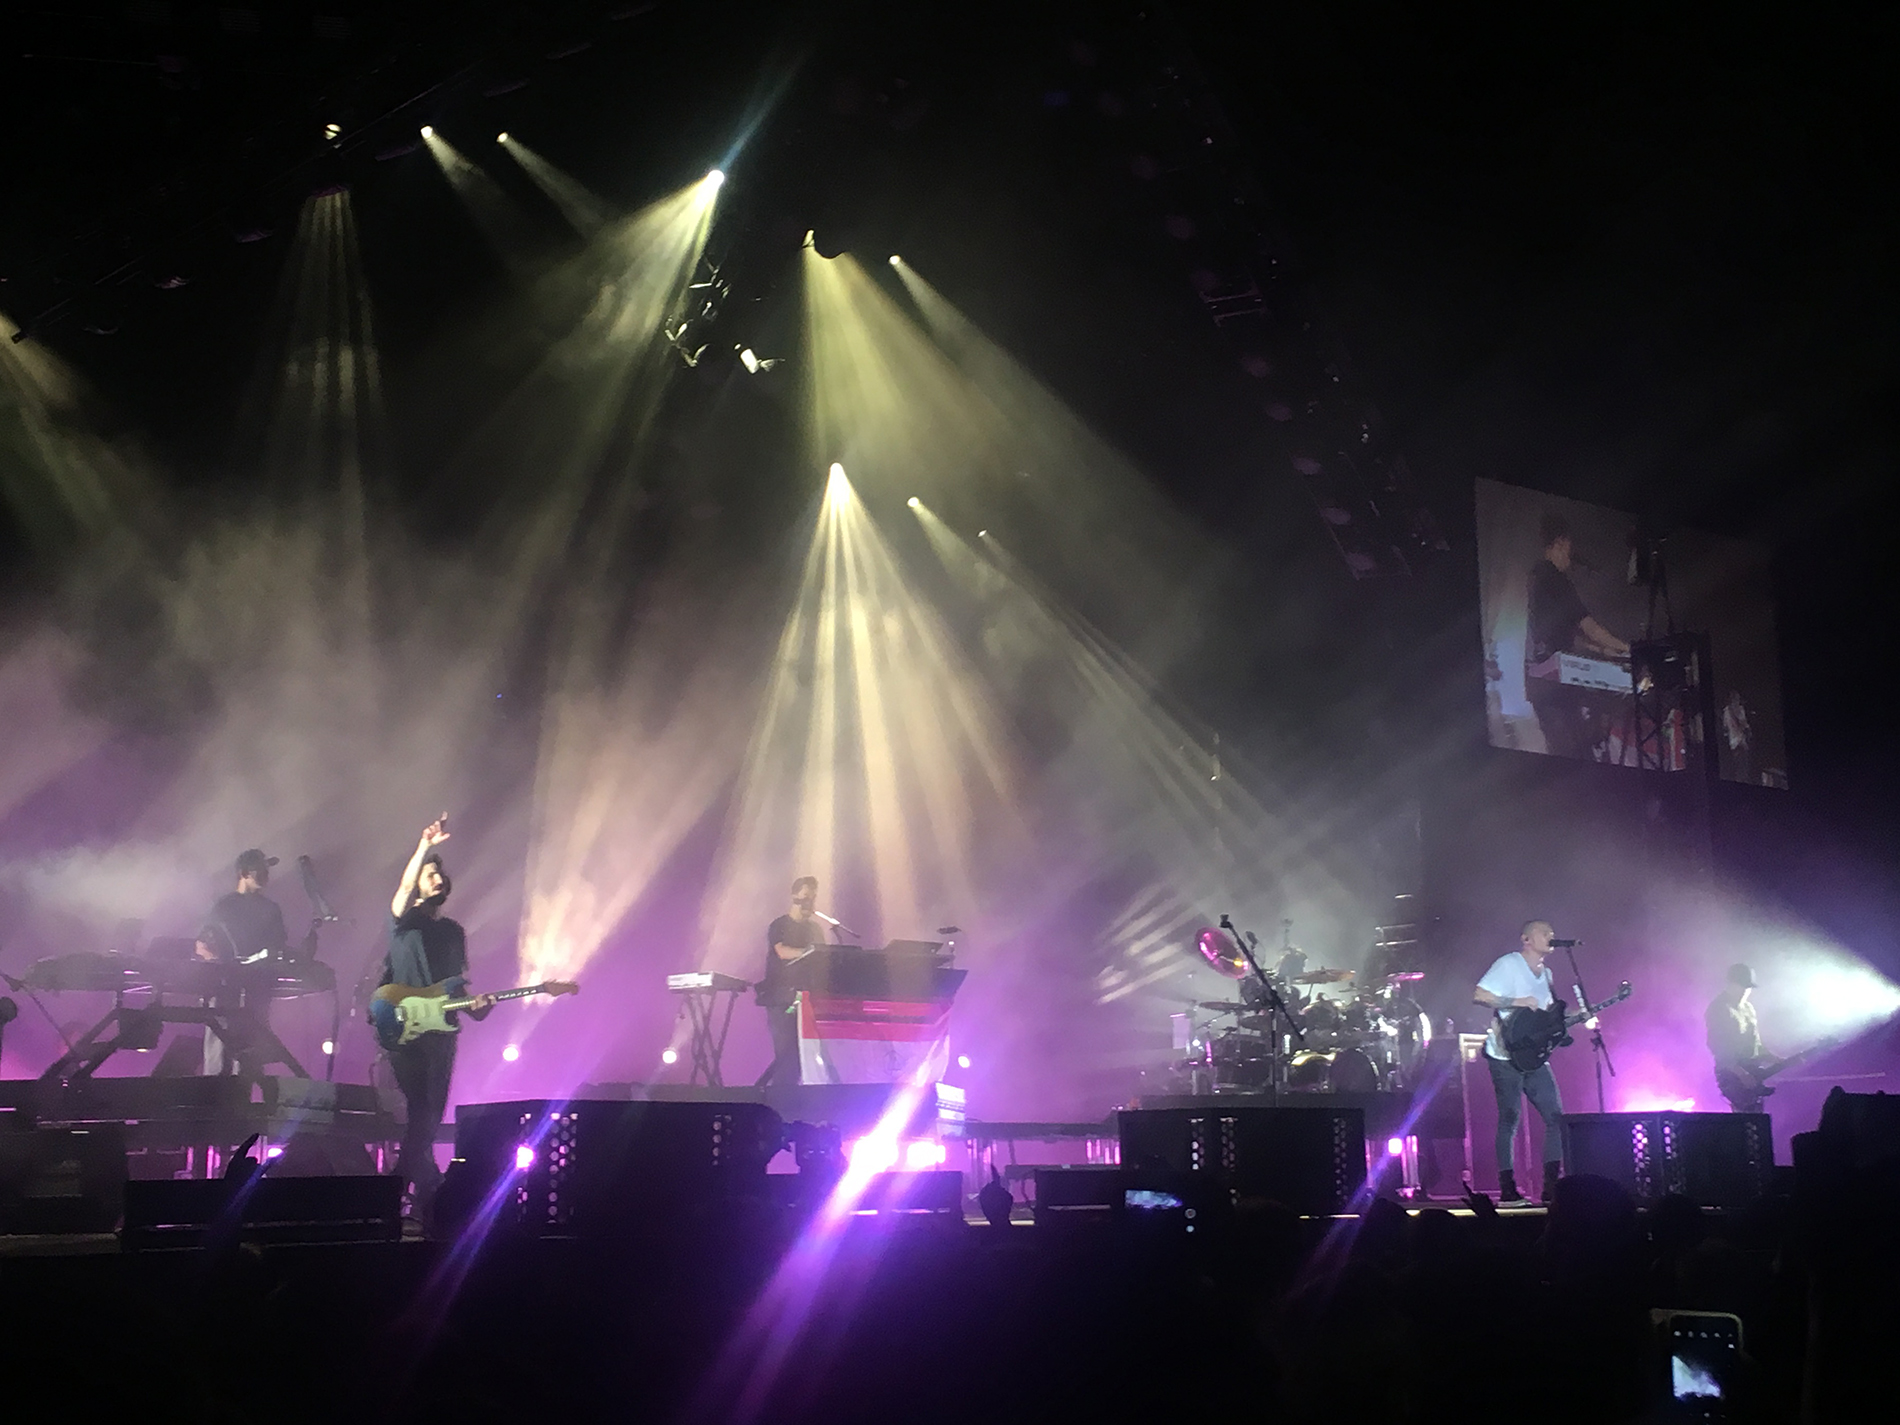 Paula Abrahão | BLOG - Projeto 6 on 6 - Linkin Park